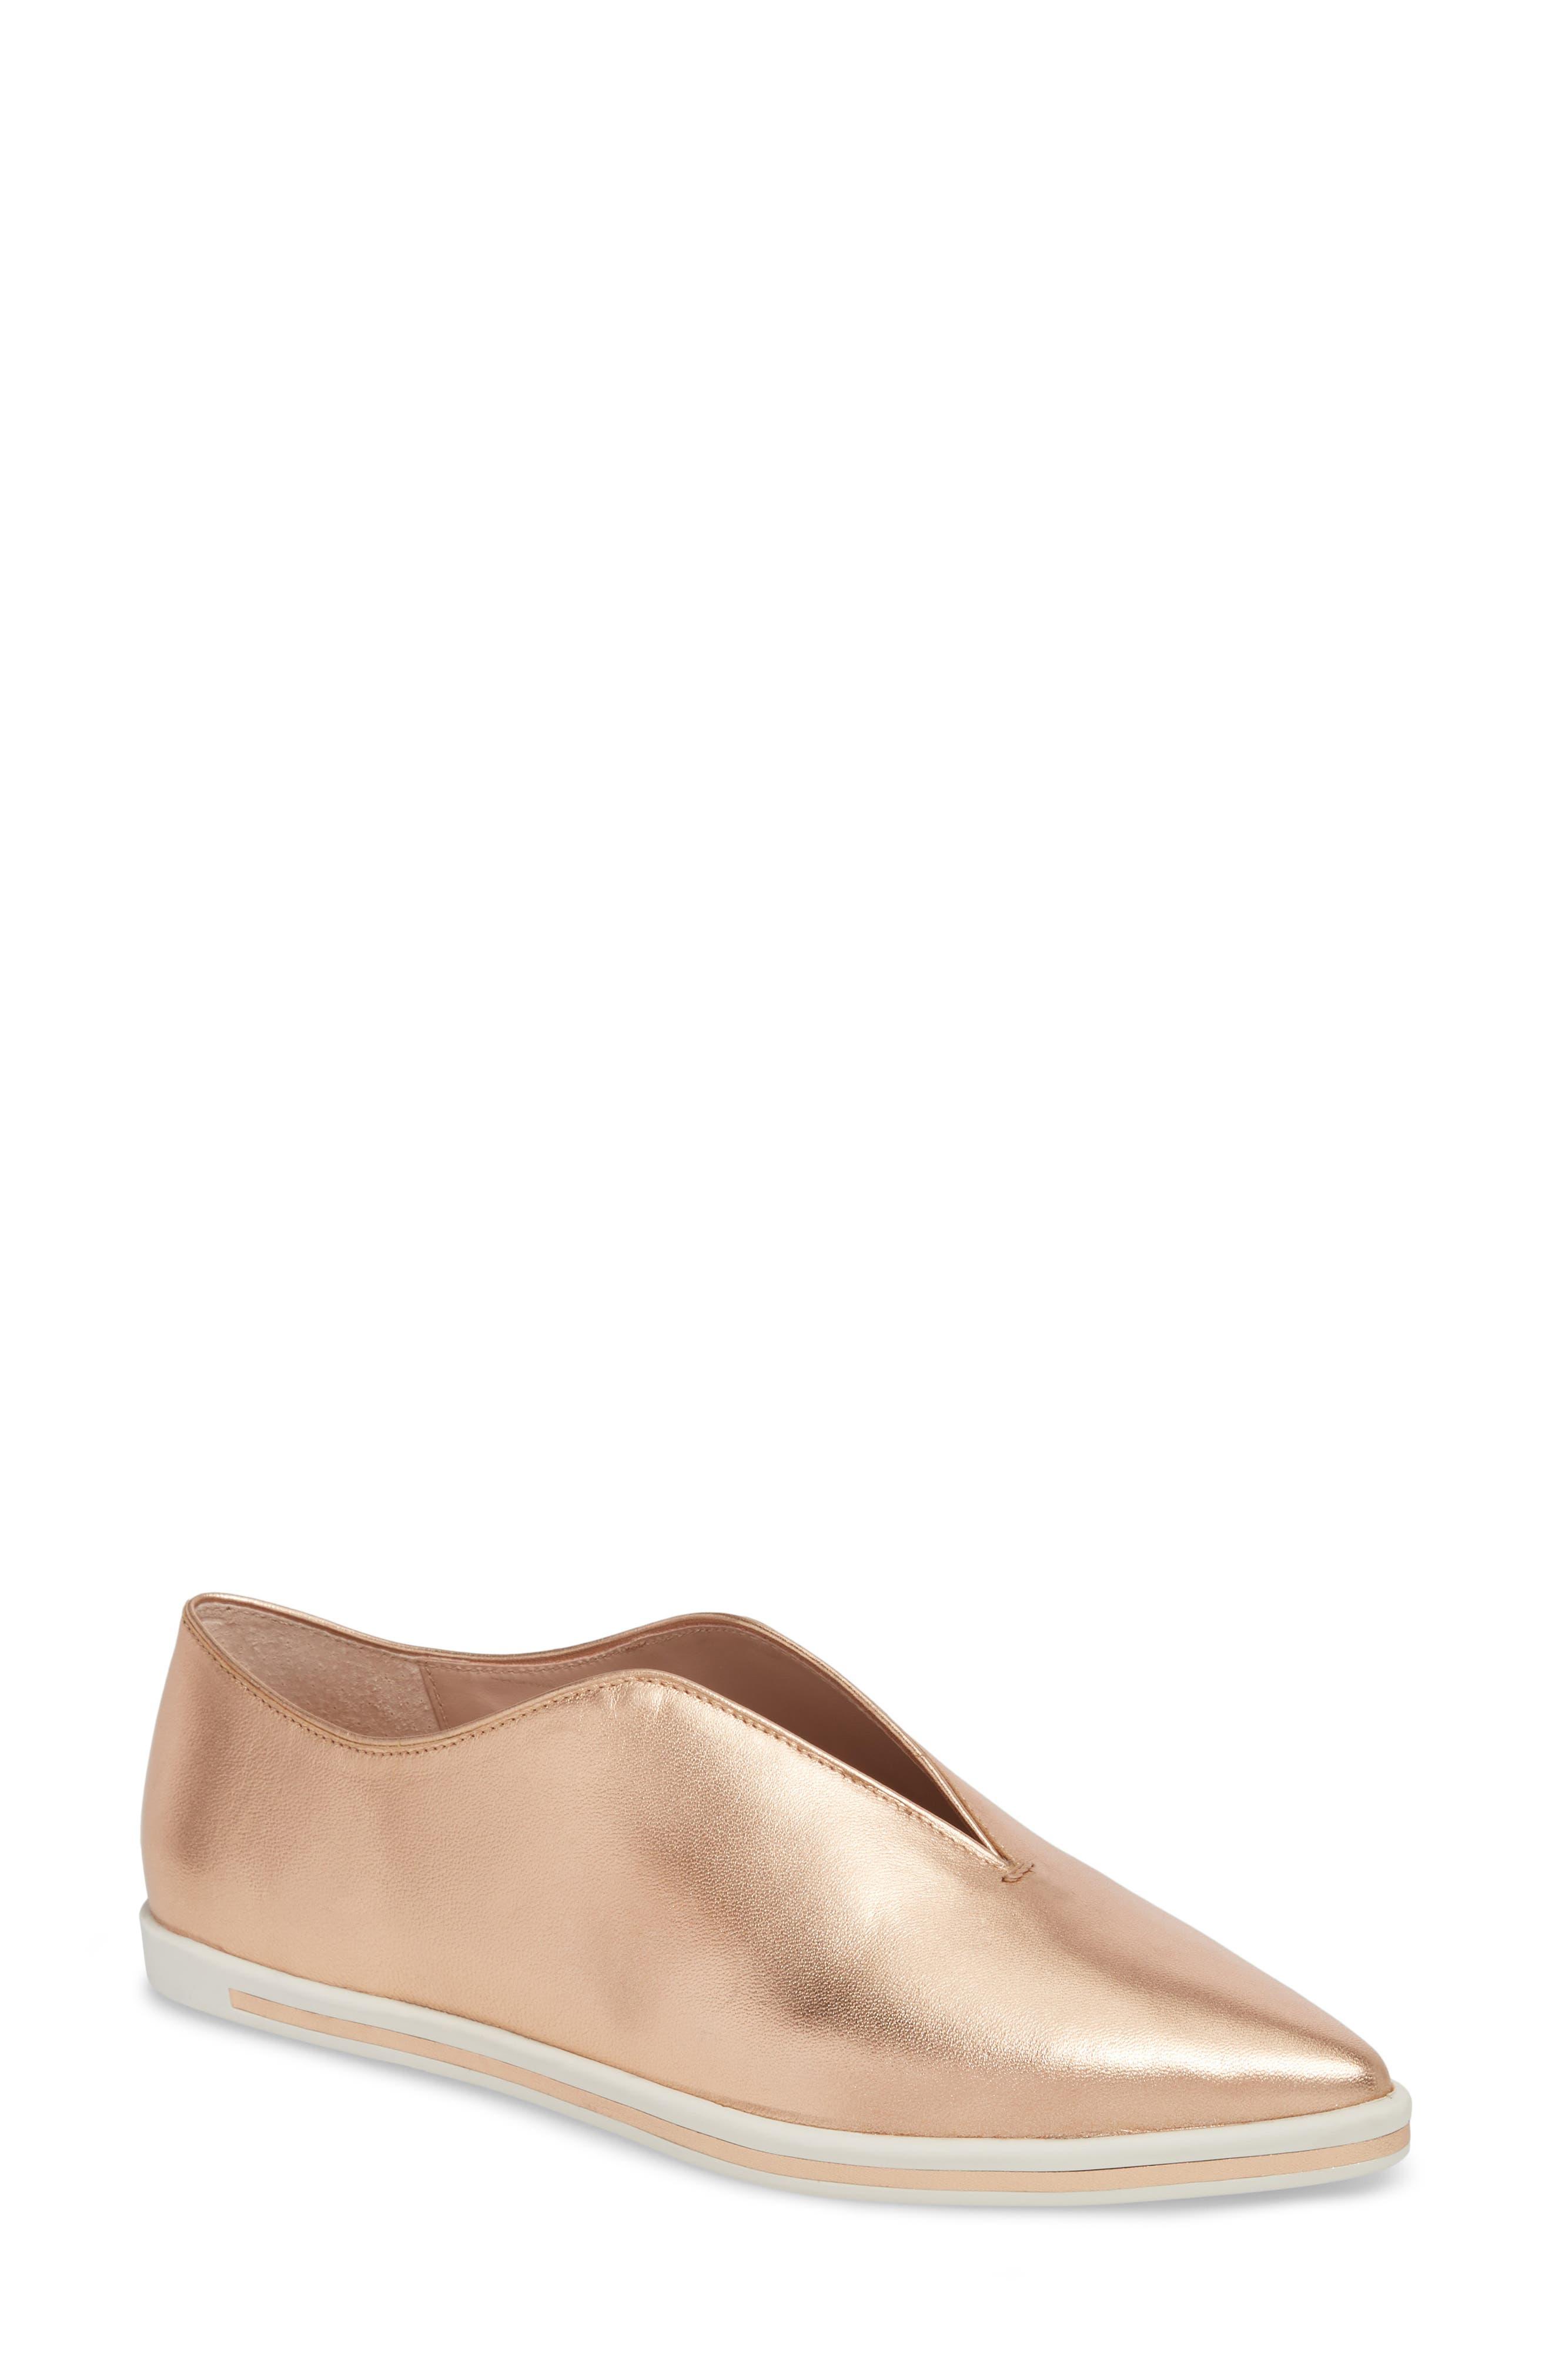 Tisha Slip-On Sneaker,                             Main thumbnail 1, color,                             Rose Gold Leather